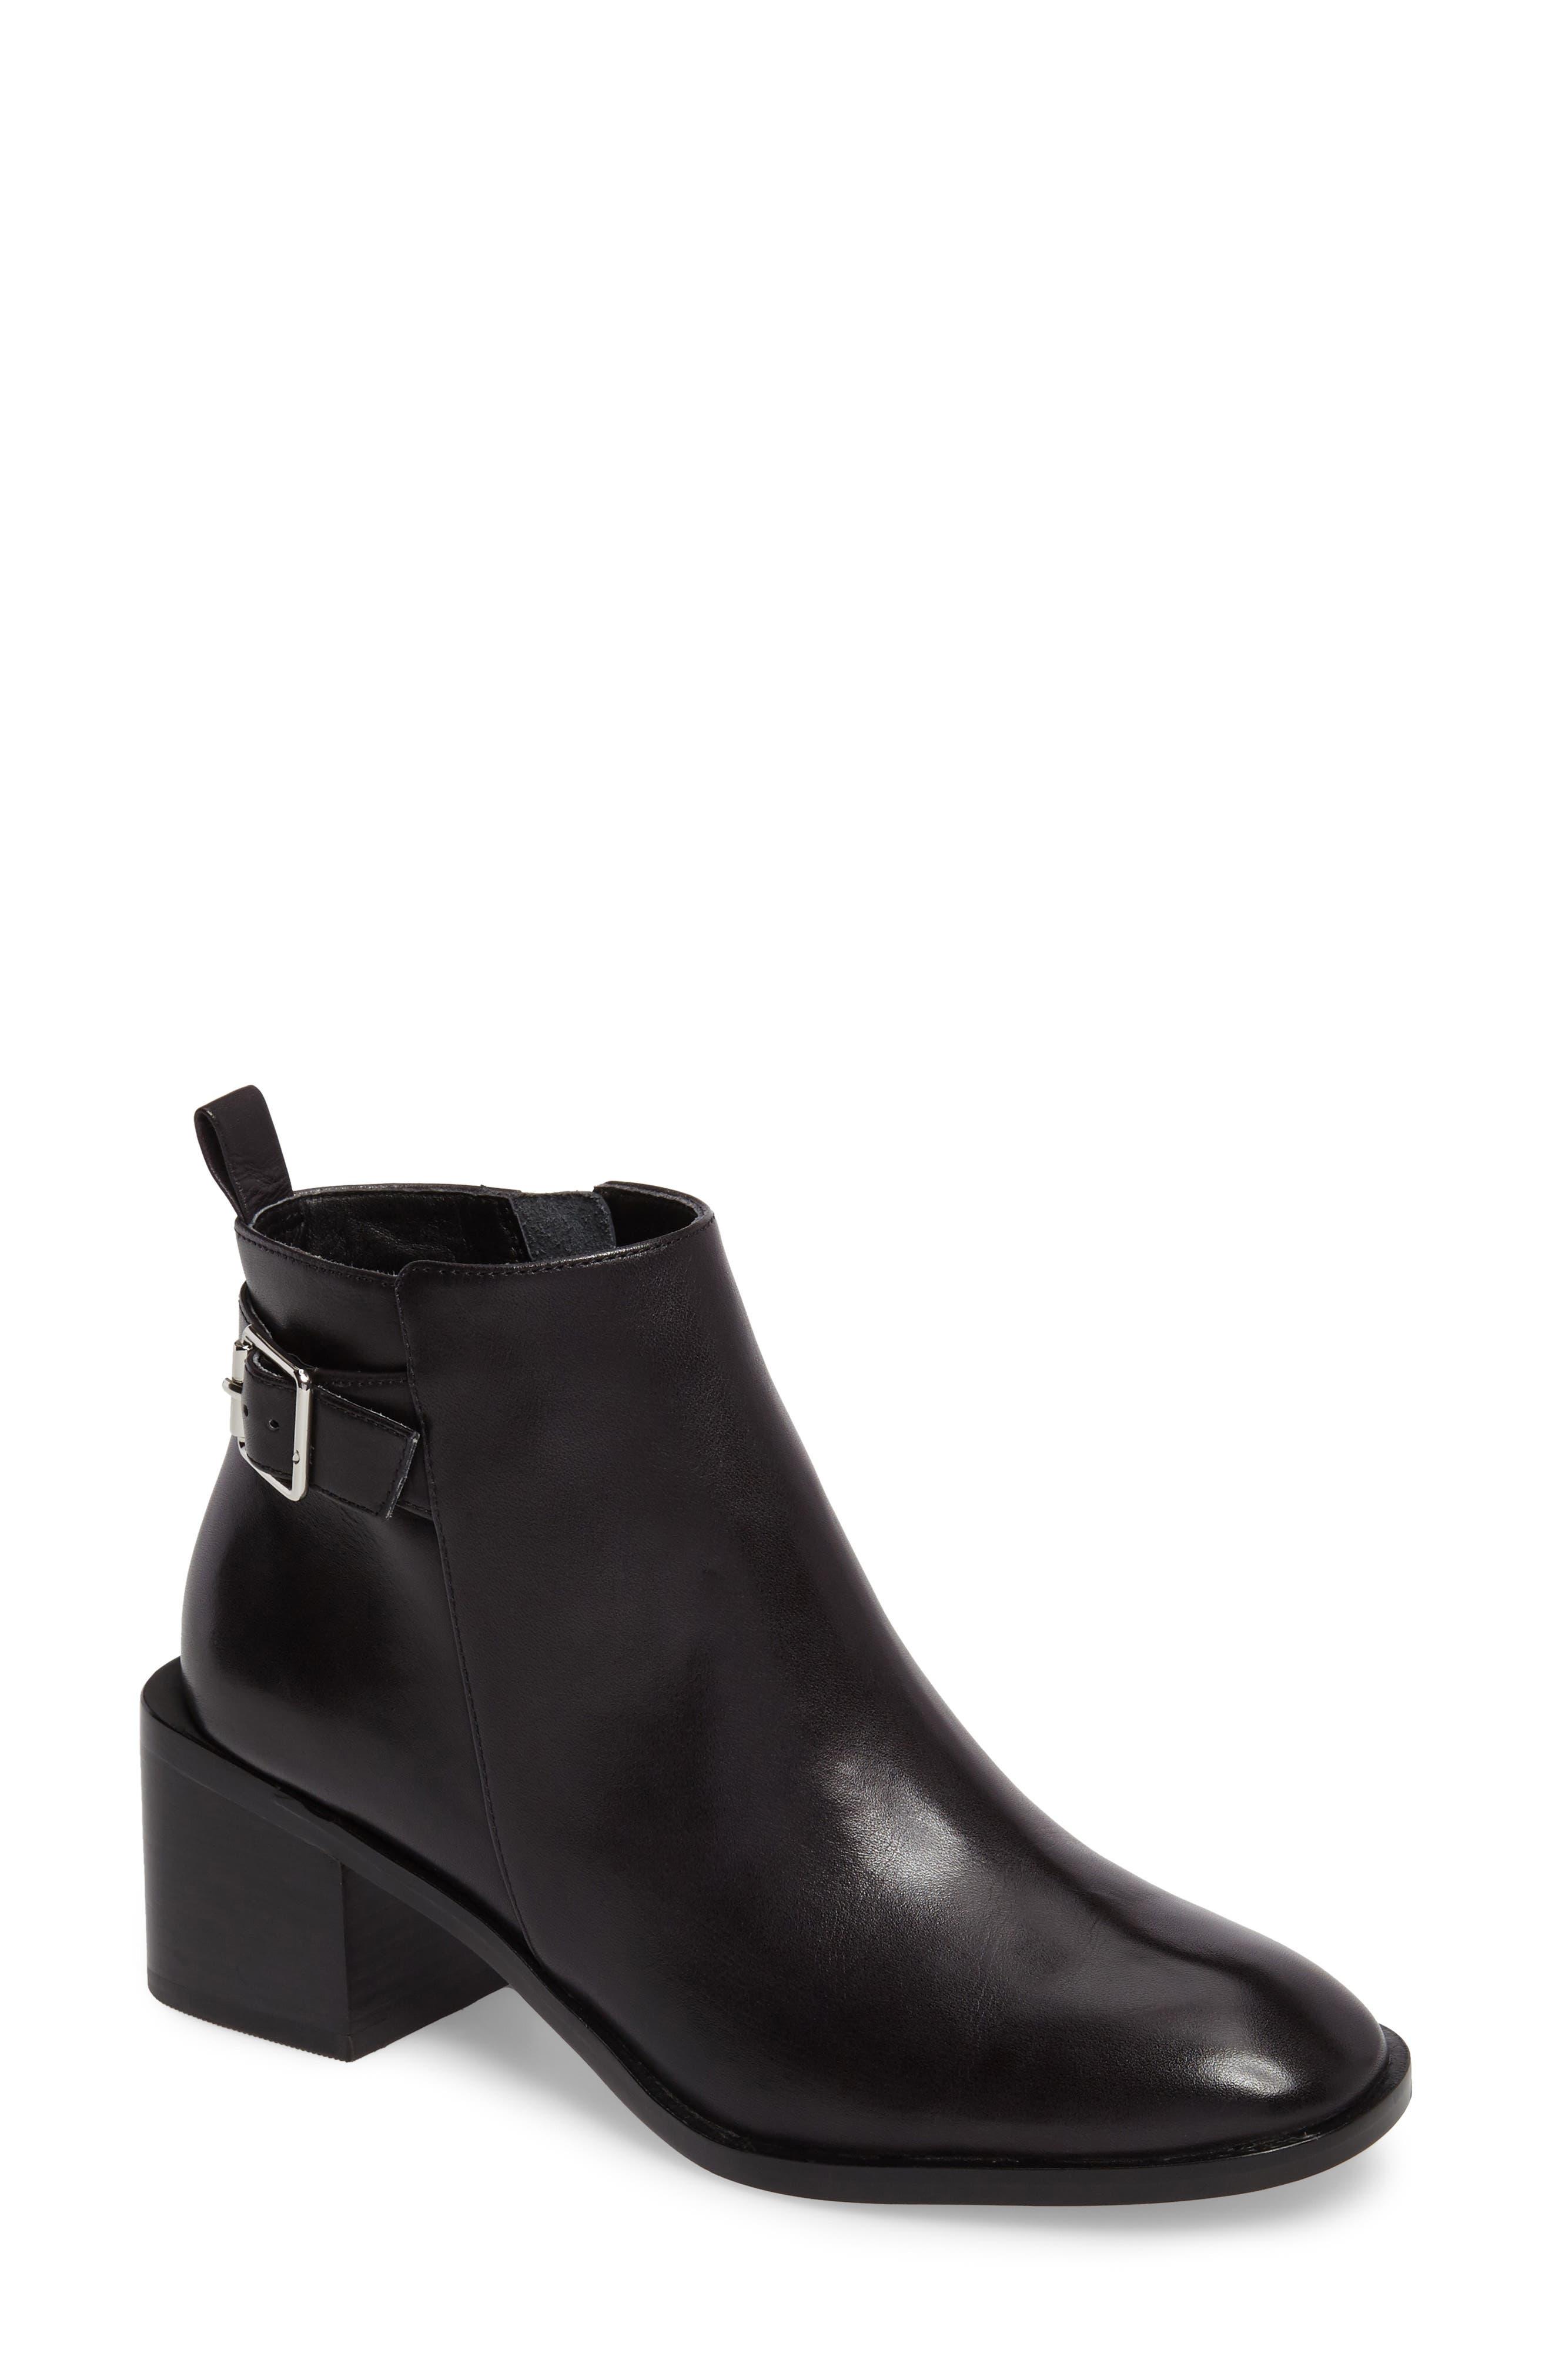 Paige Block Heel Boot,                         Main,                         color, 005